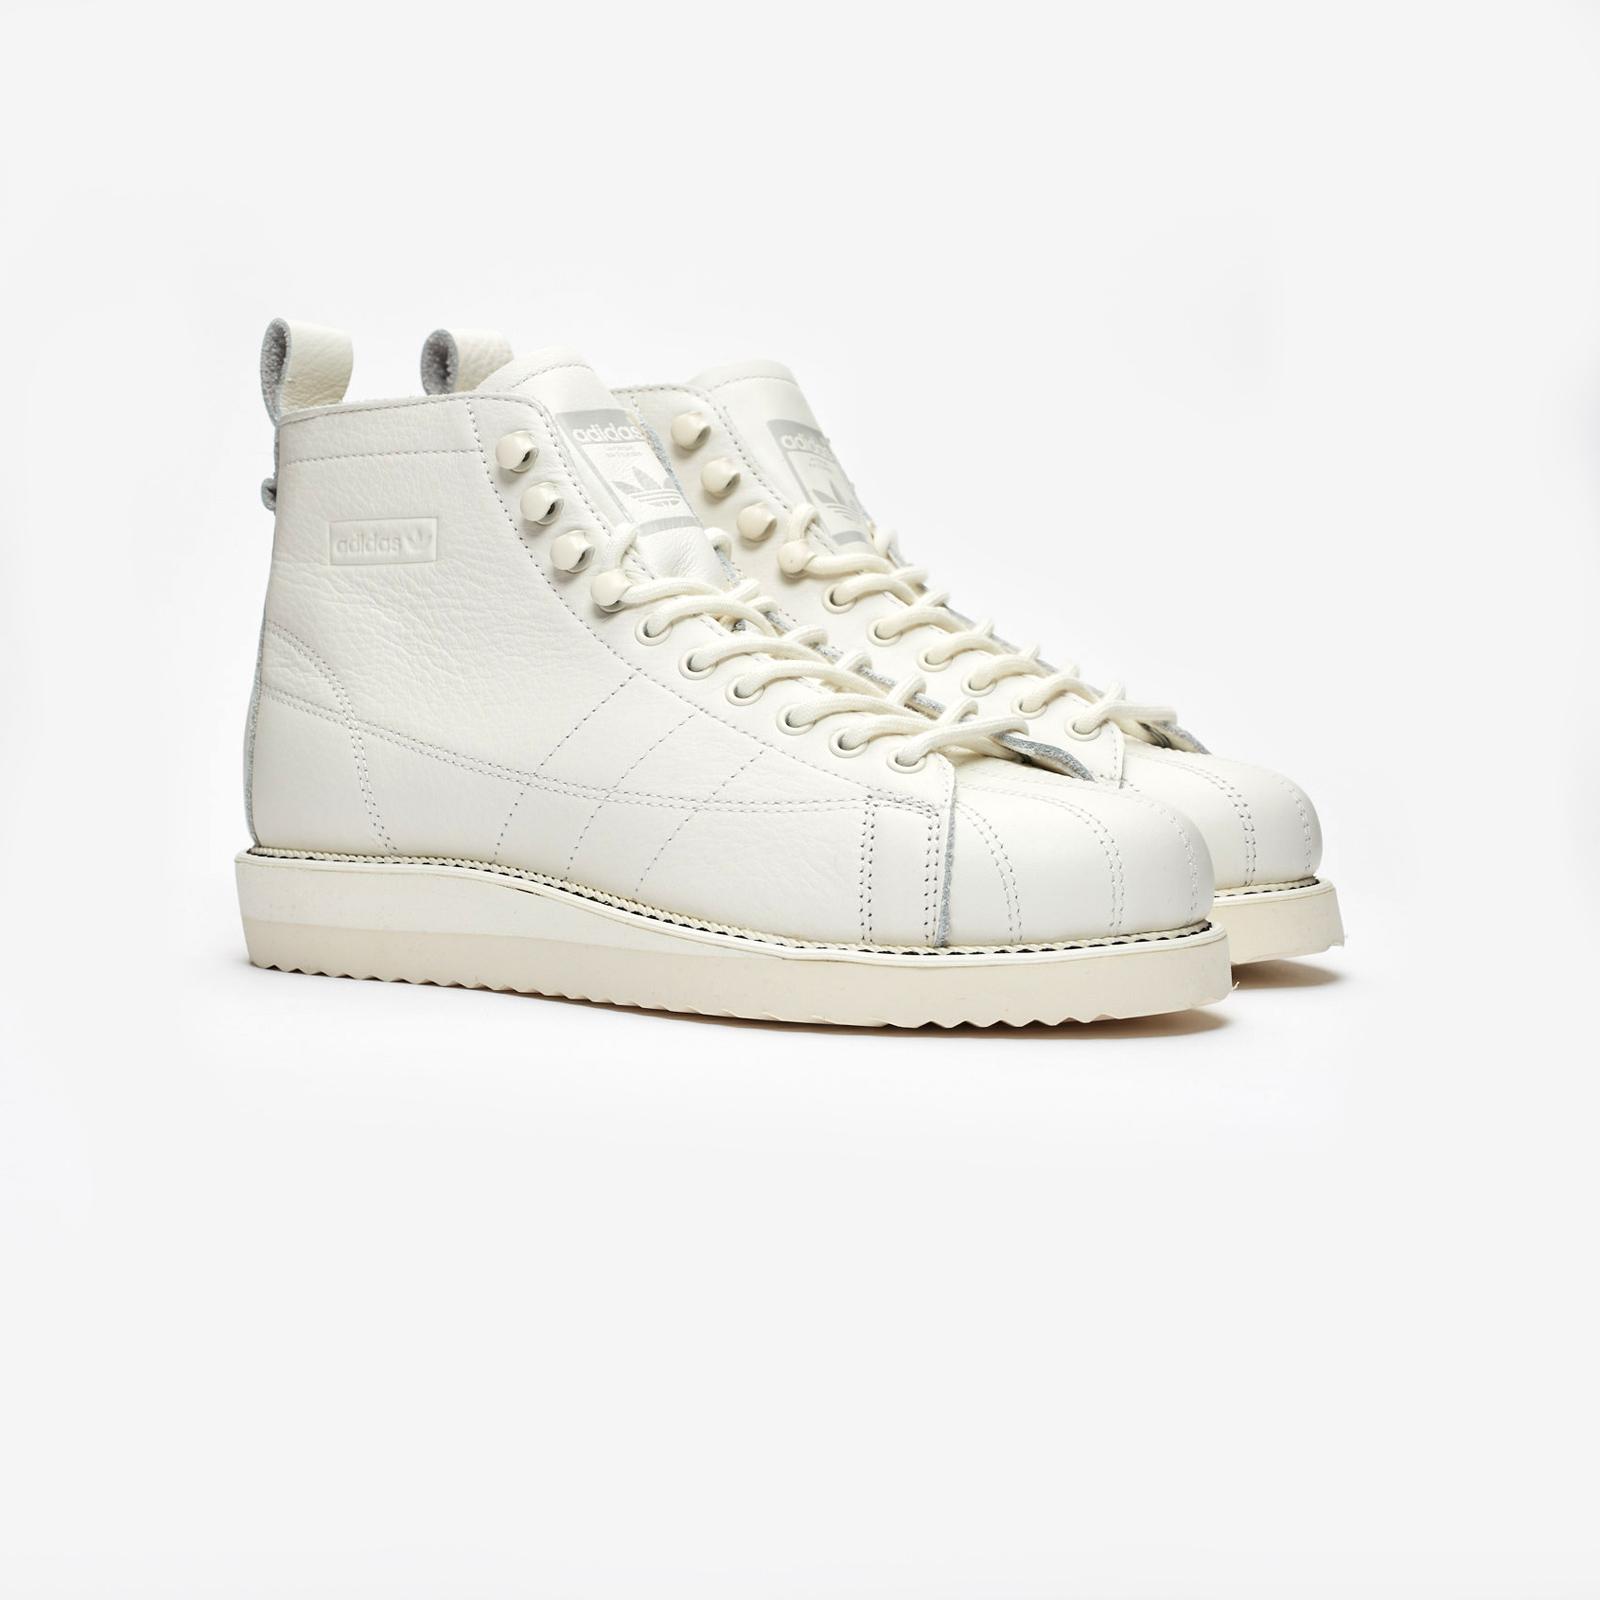 Adidas Superstar Boot W B28162 Sneakersnstuff Sneakers